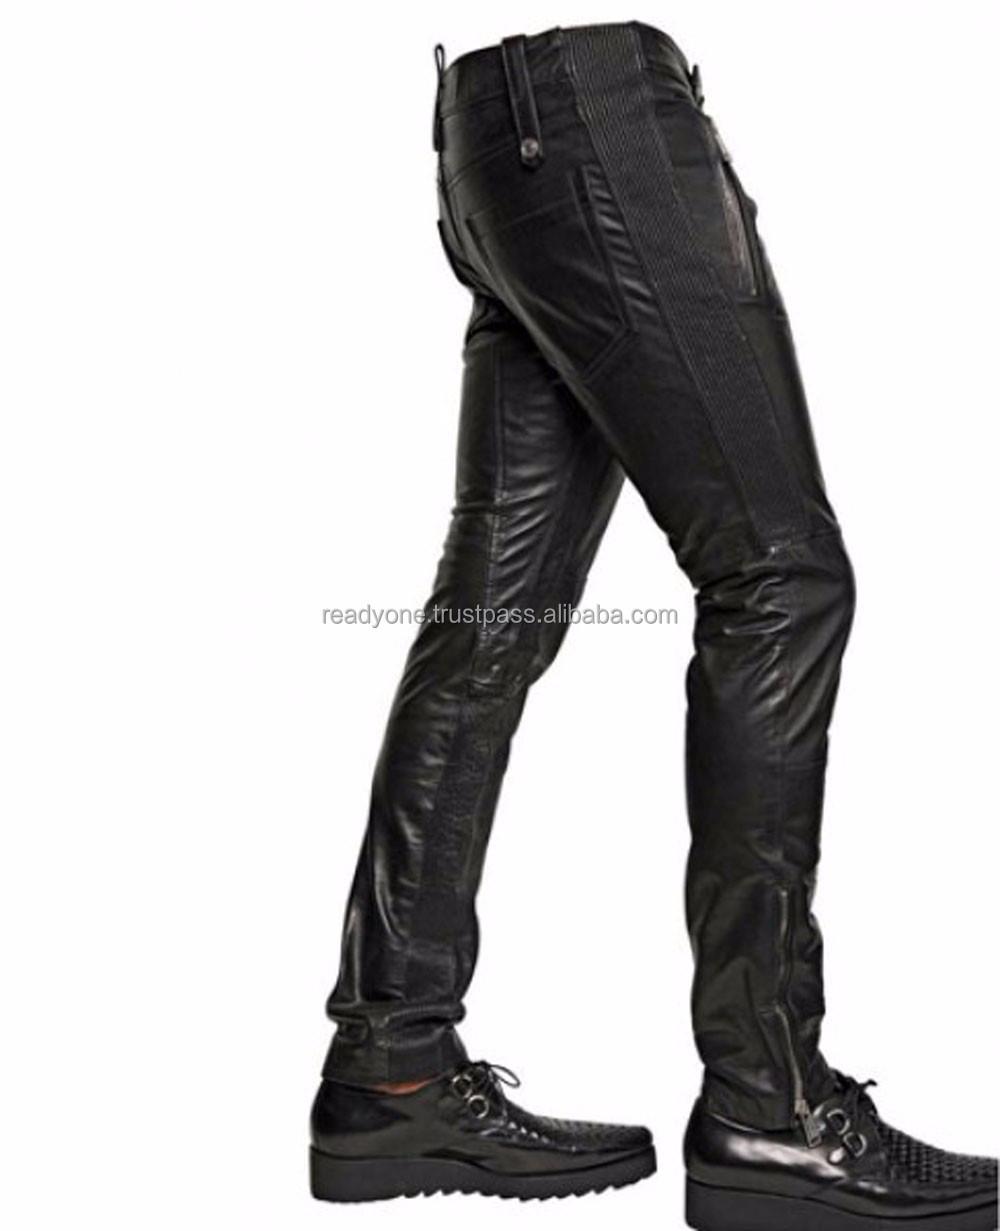 Uomo Pantaloni in Pelle Vera Cuoio Punk Kink jeans pantaloni pants BLUF bikers